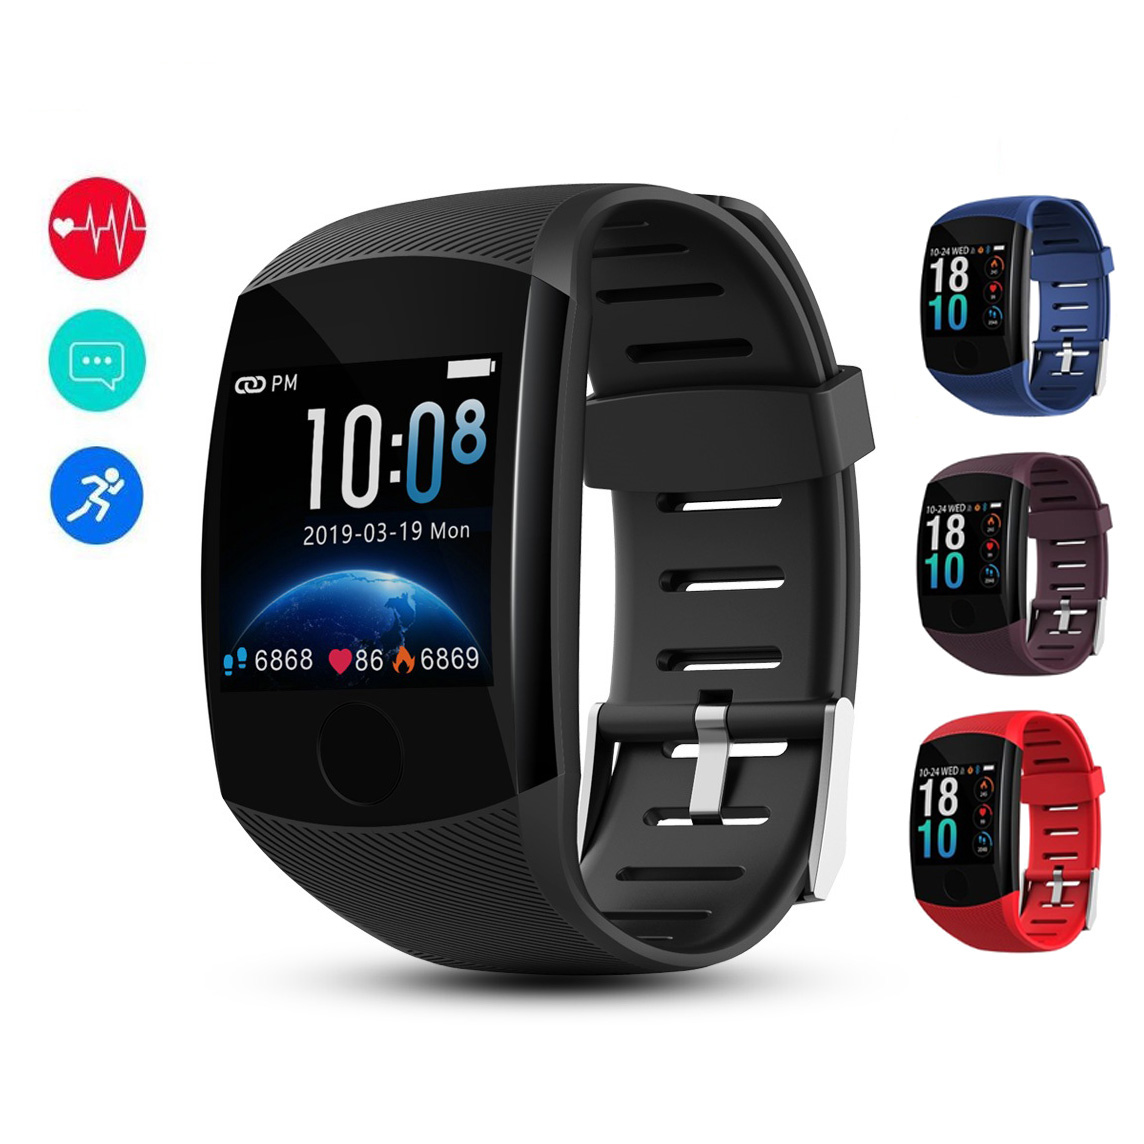 NEW Q11 Smart Watch Touch Screen IP67 Waterproof Fitness Bracelet OLED Message Heart Rate Smartband Activity Tracker sport watch